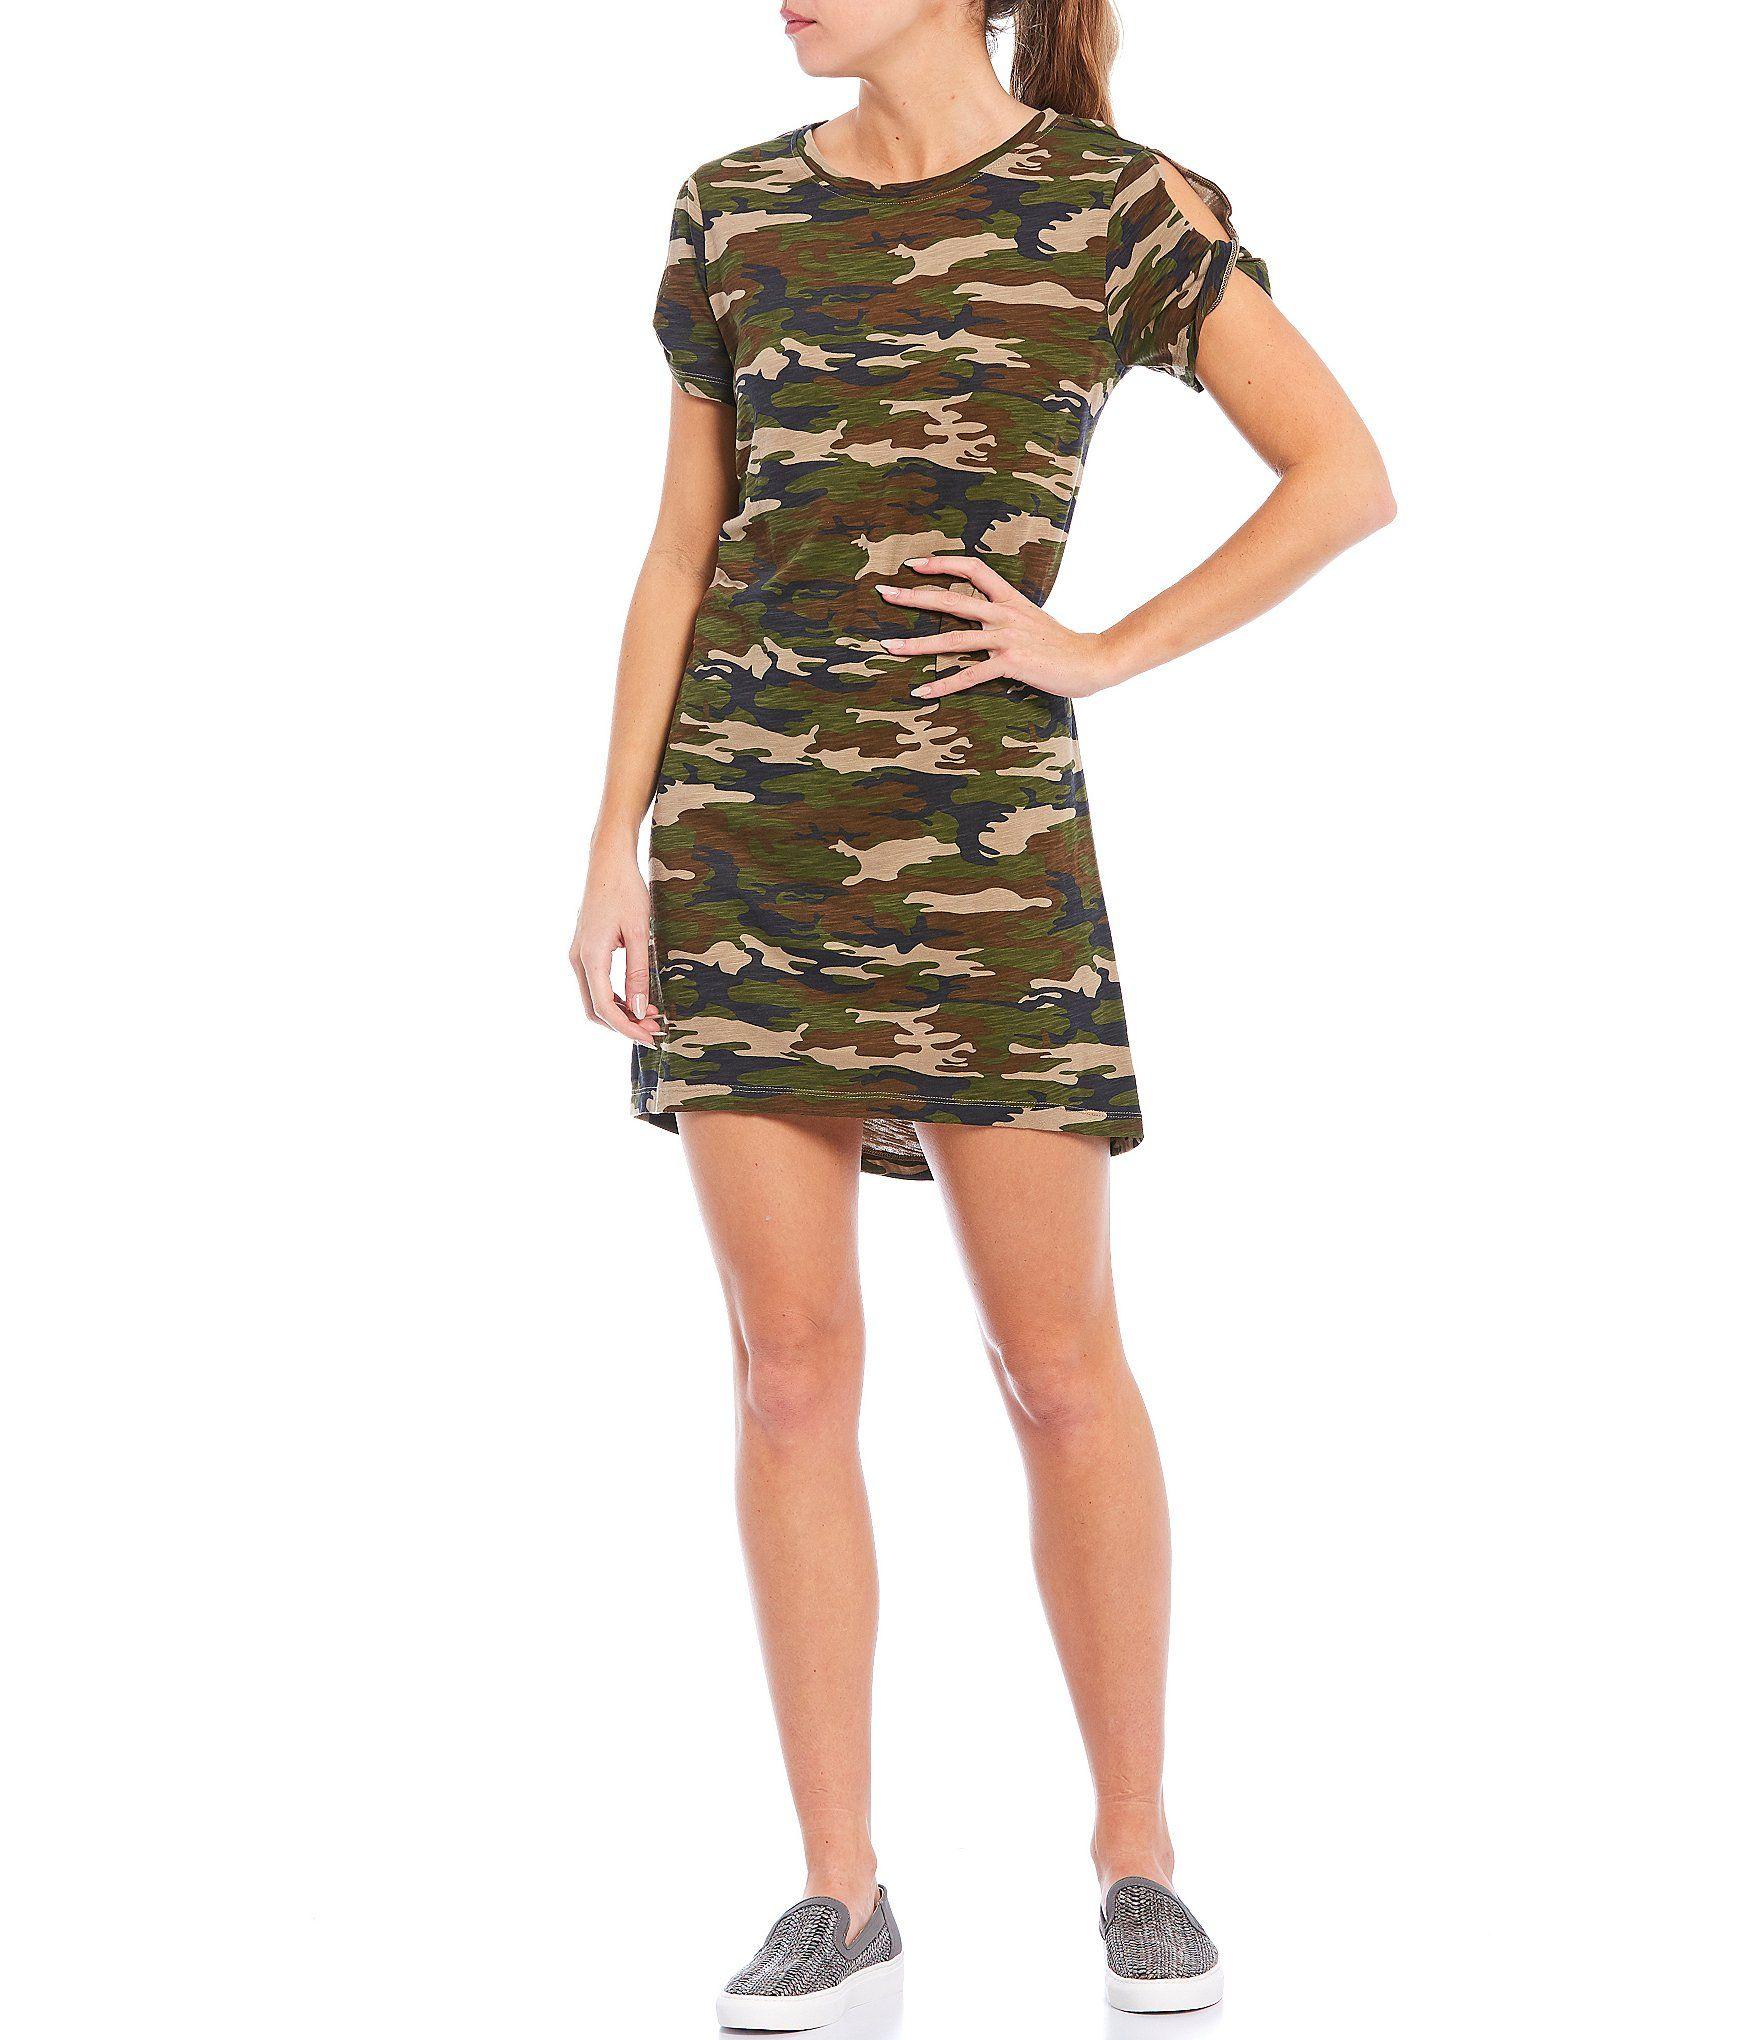 Sanctuary Camo T Shirt Short Sleeve Knit Dress Dillard S In 2021 Camo Dress Knit Dress Dresses [ 2040 x 1760 Pixel ]